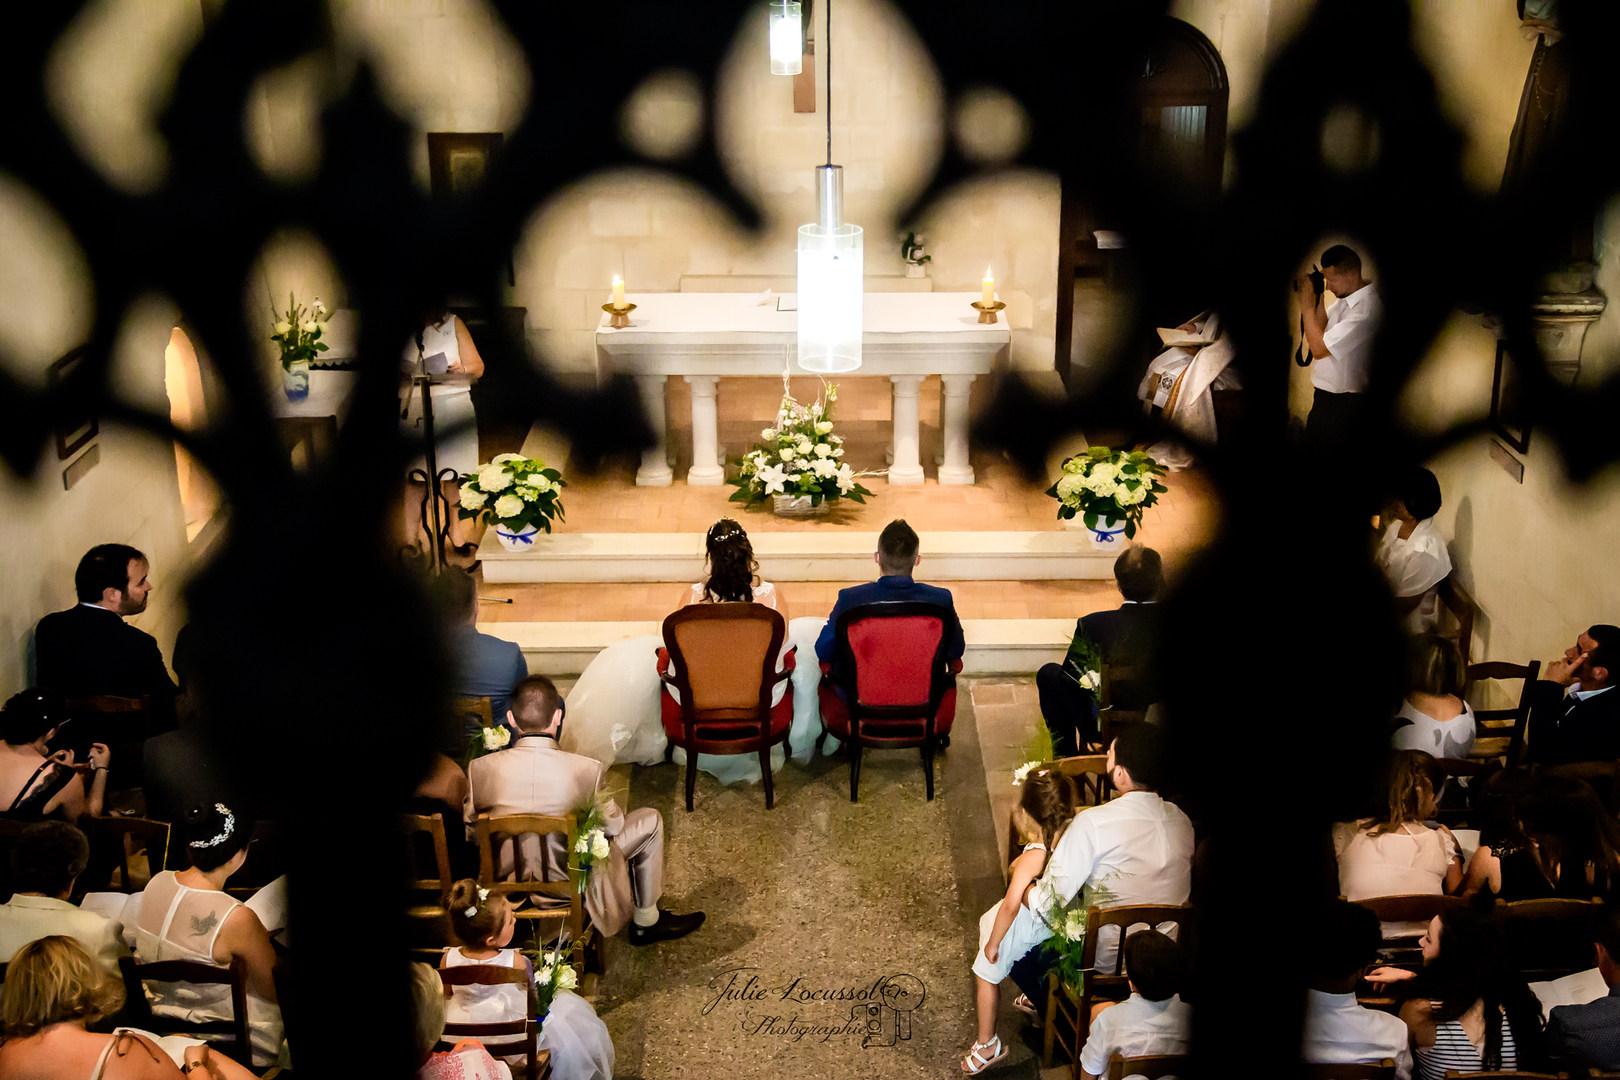 Cérémonie mariage vu d'ailleurs...